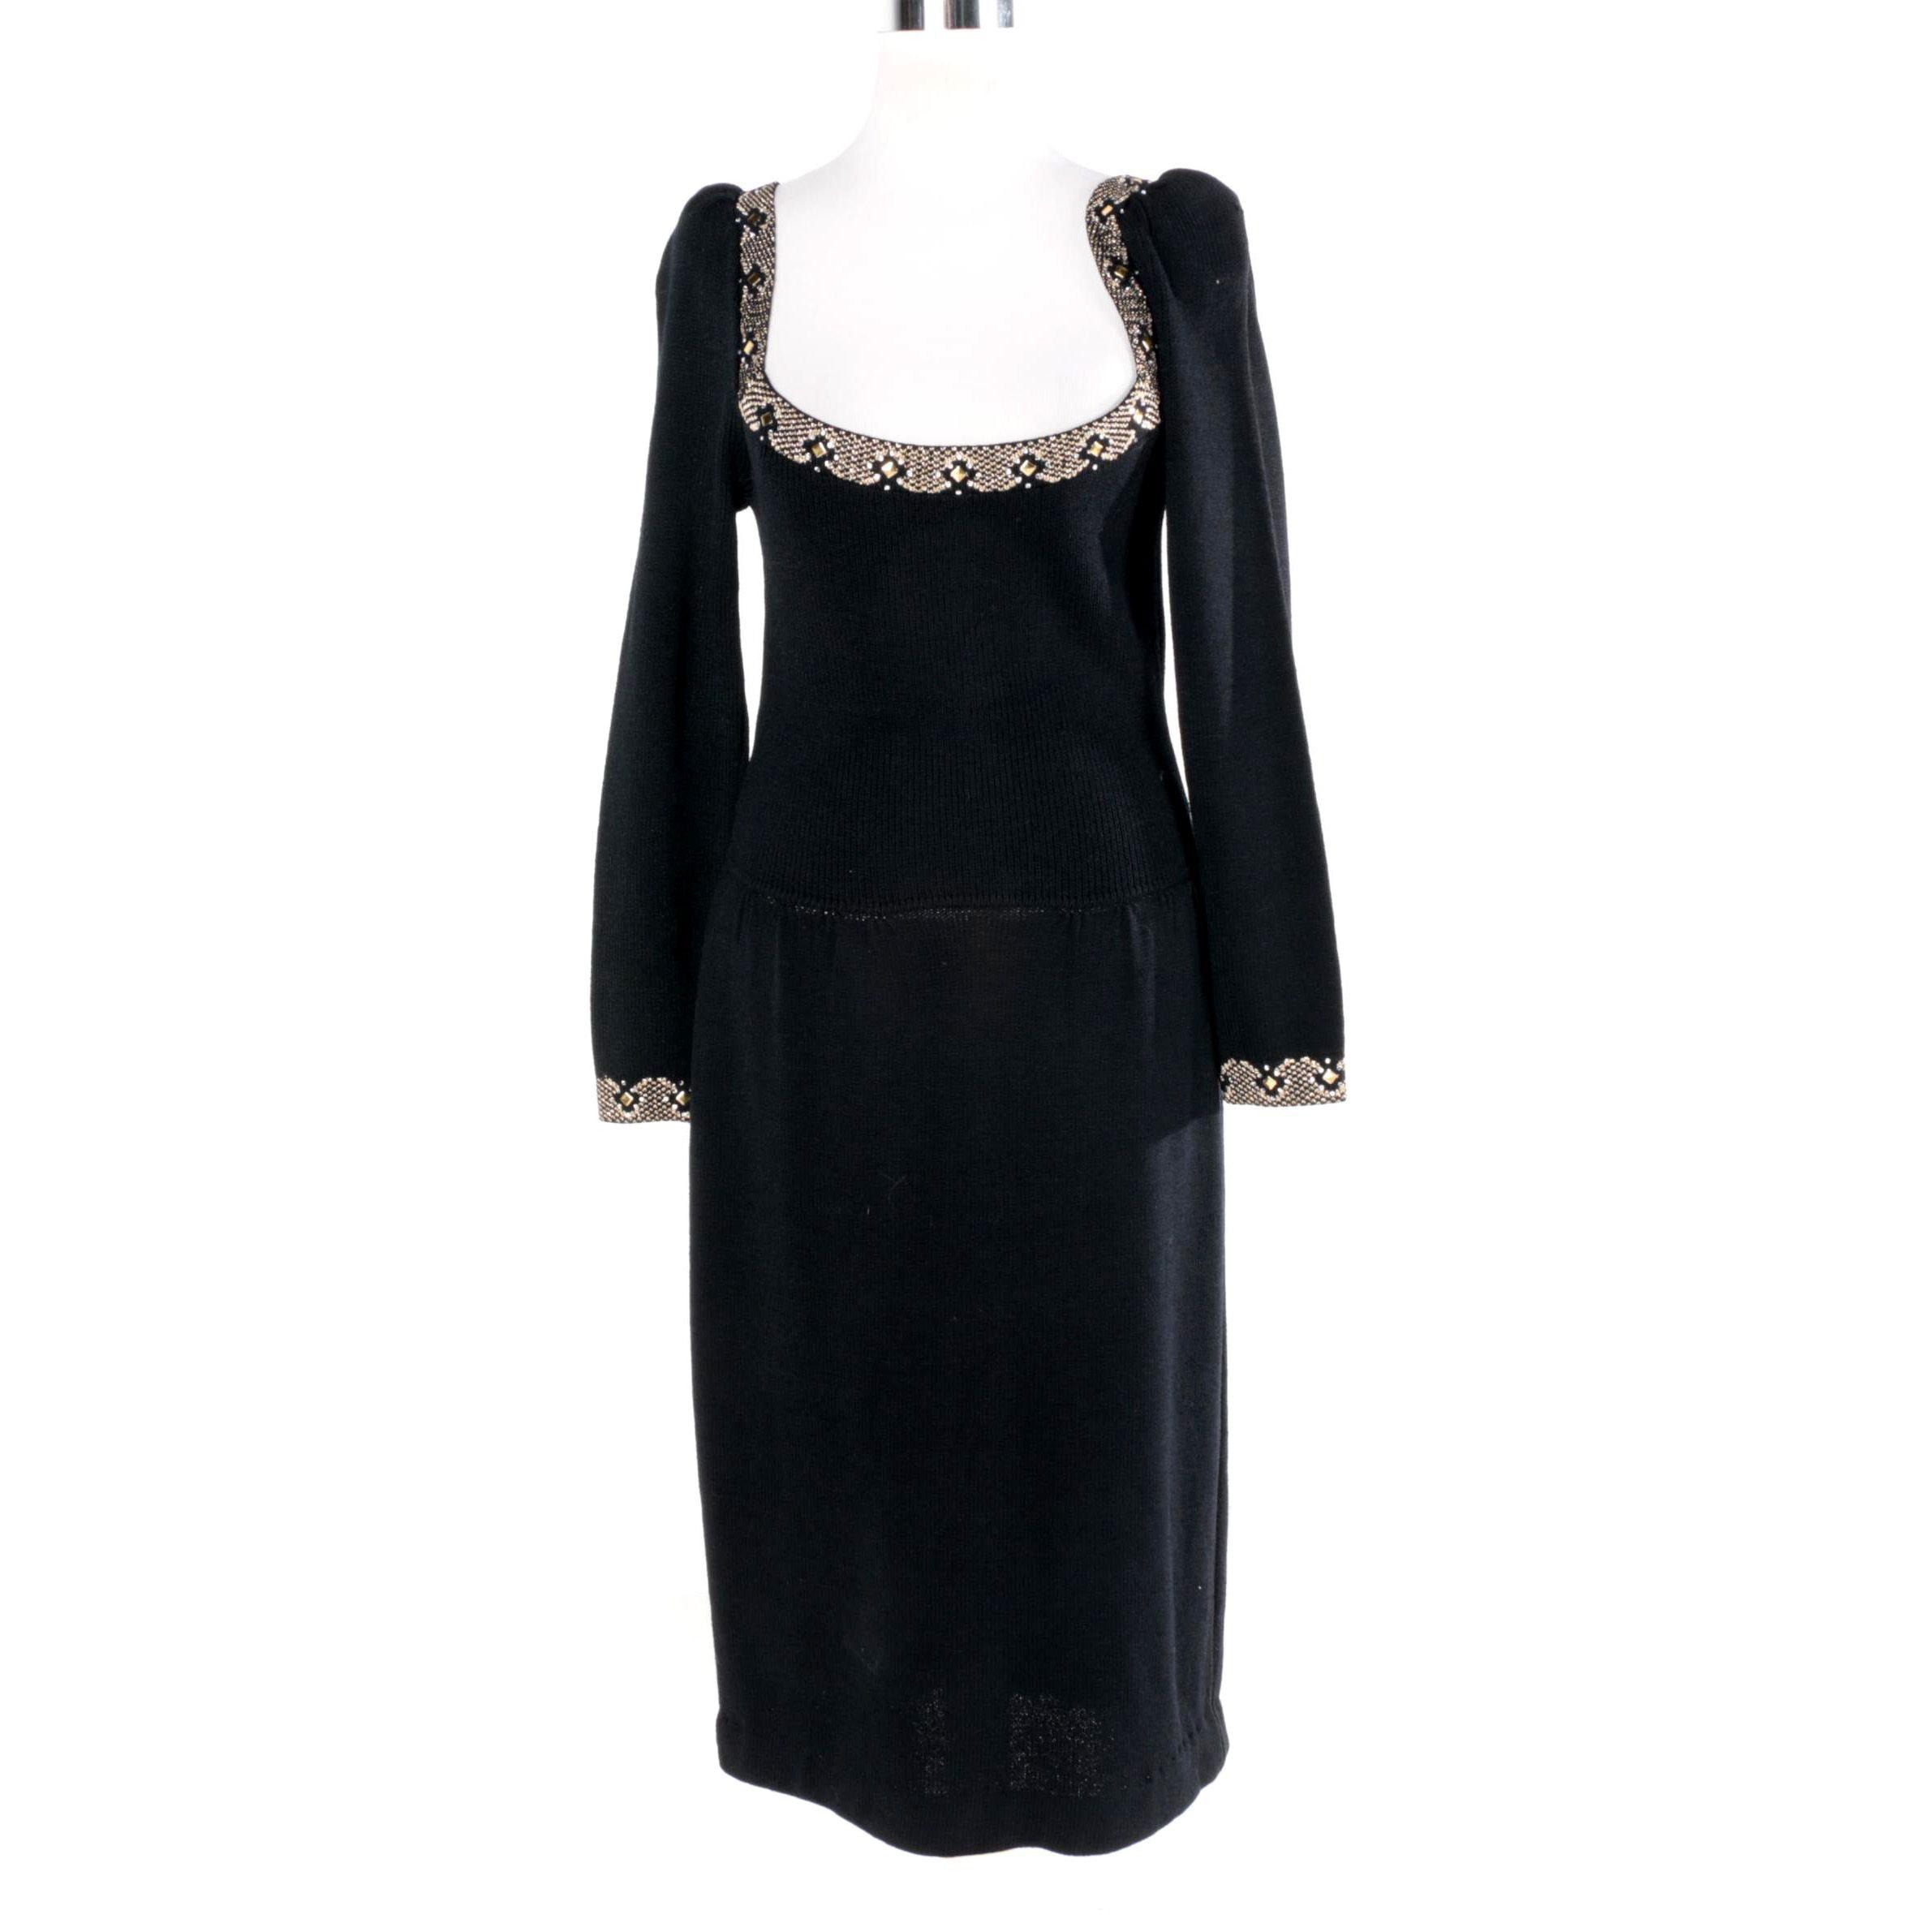 Women's St. John Evening Embellished Dress